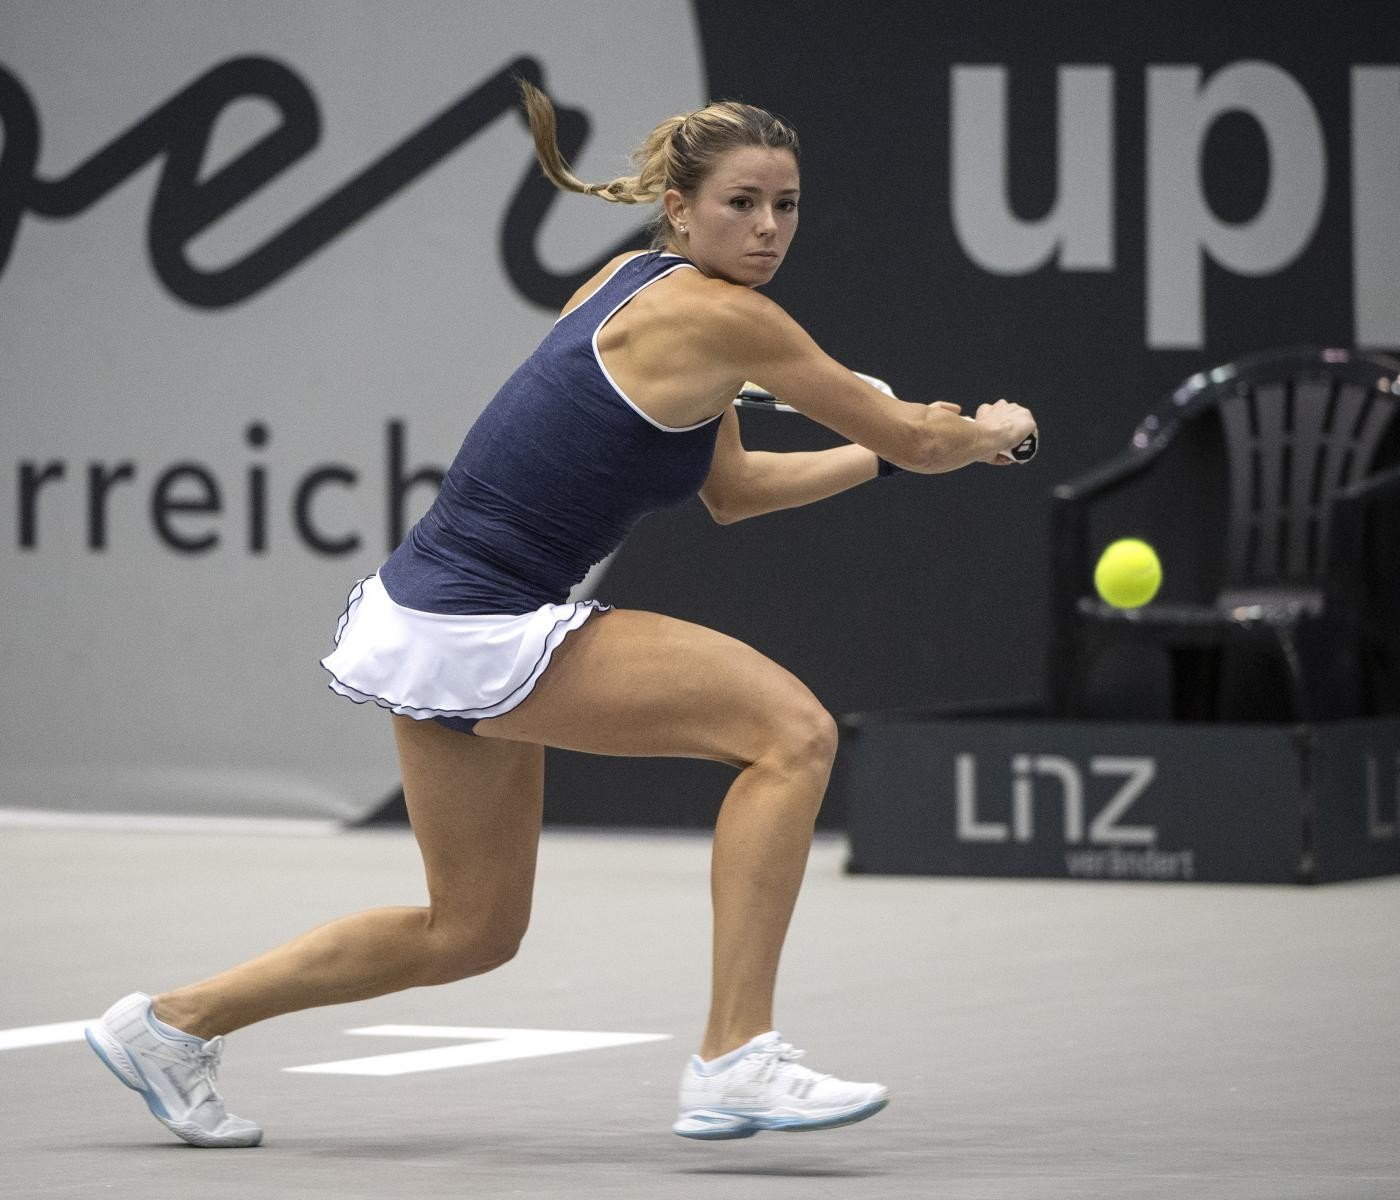 Tennis, Cecchinato battuto da Djokovic a Shanghai